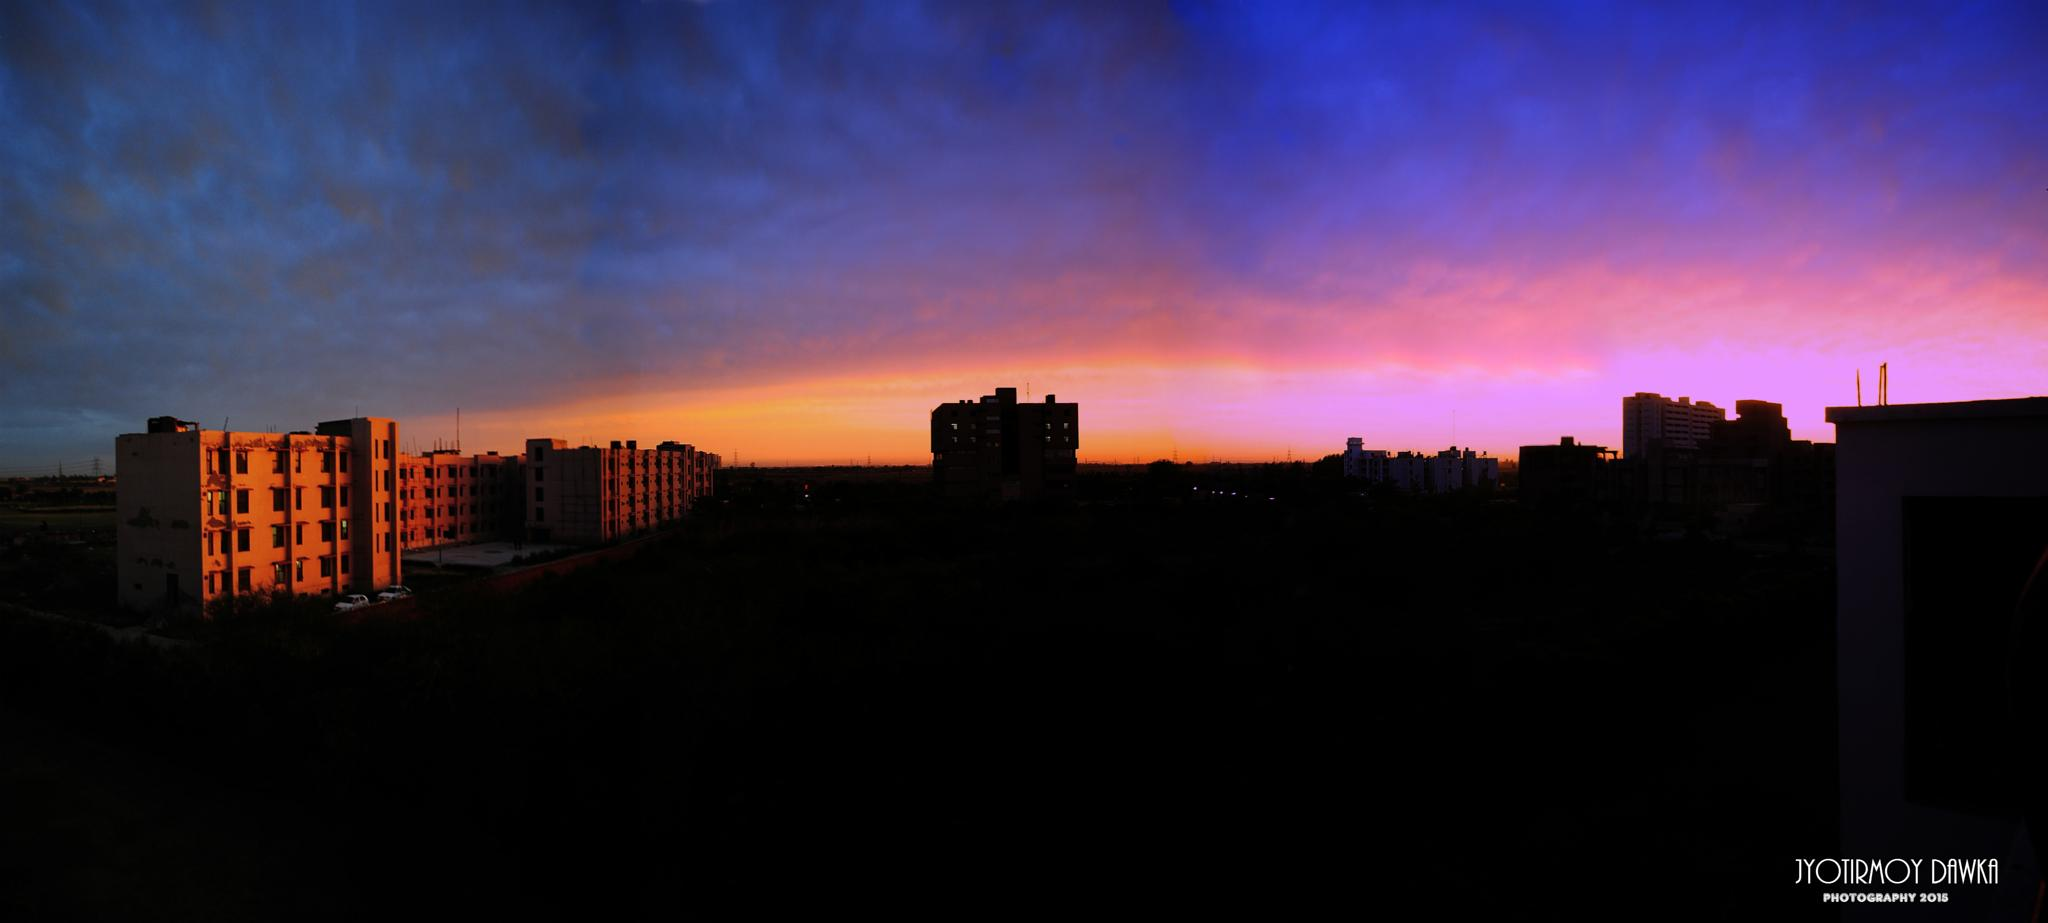 Panorama by Jyotirmoy Dawka